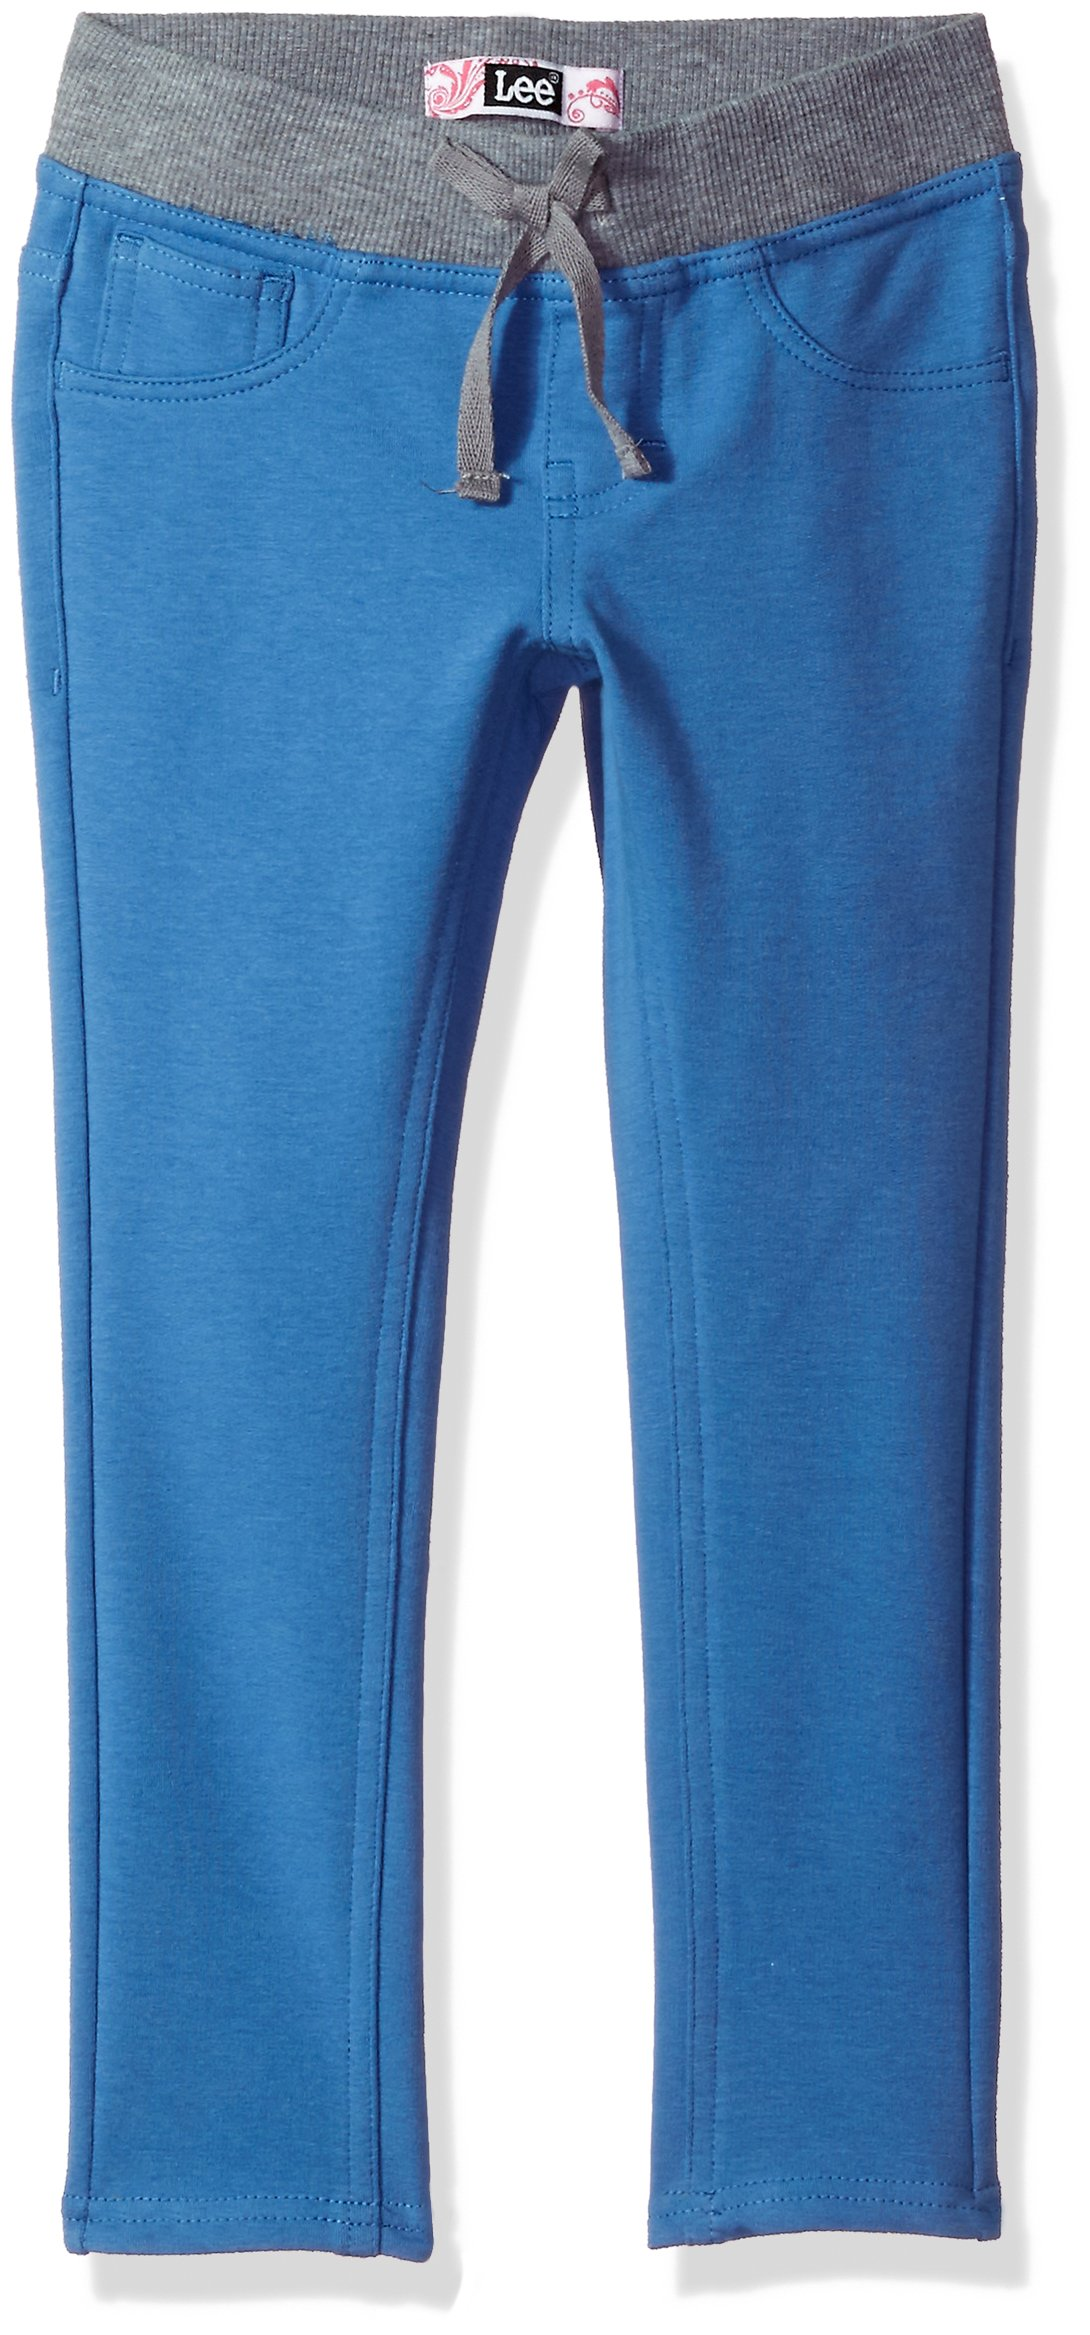 LEE Big Girls' Knit Waist Skinny Pull on Pant, River Blue, 7